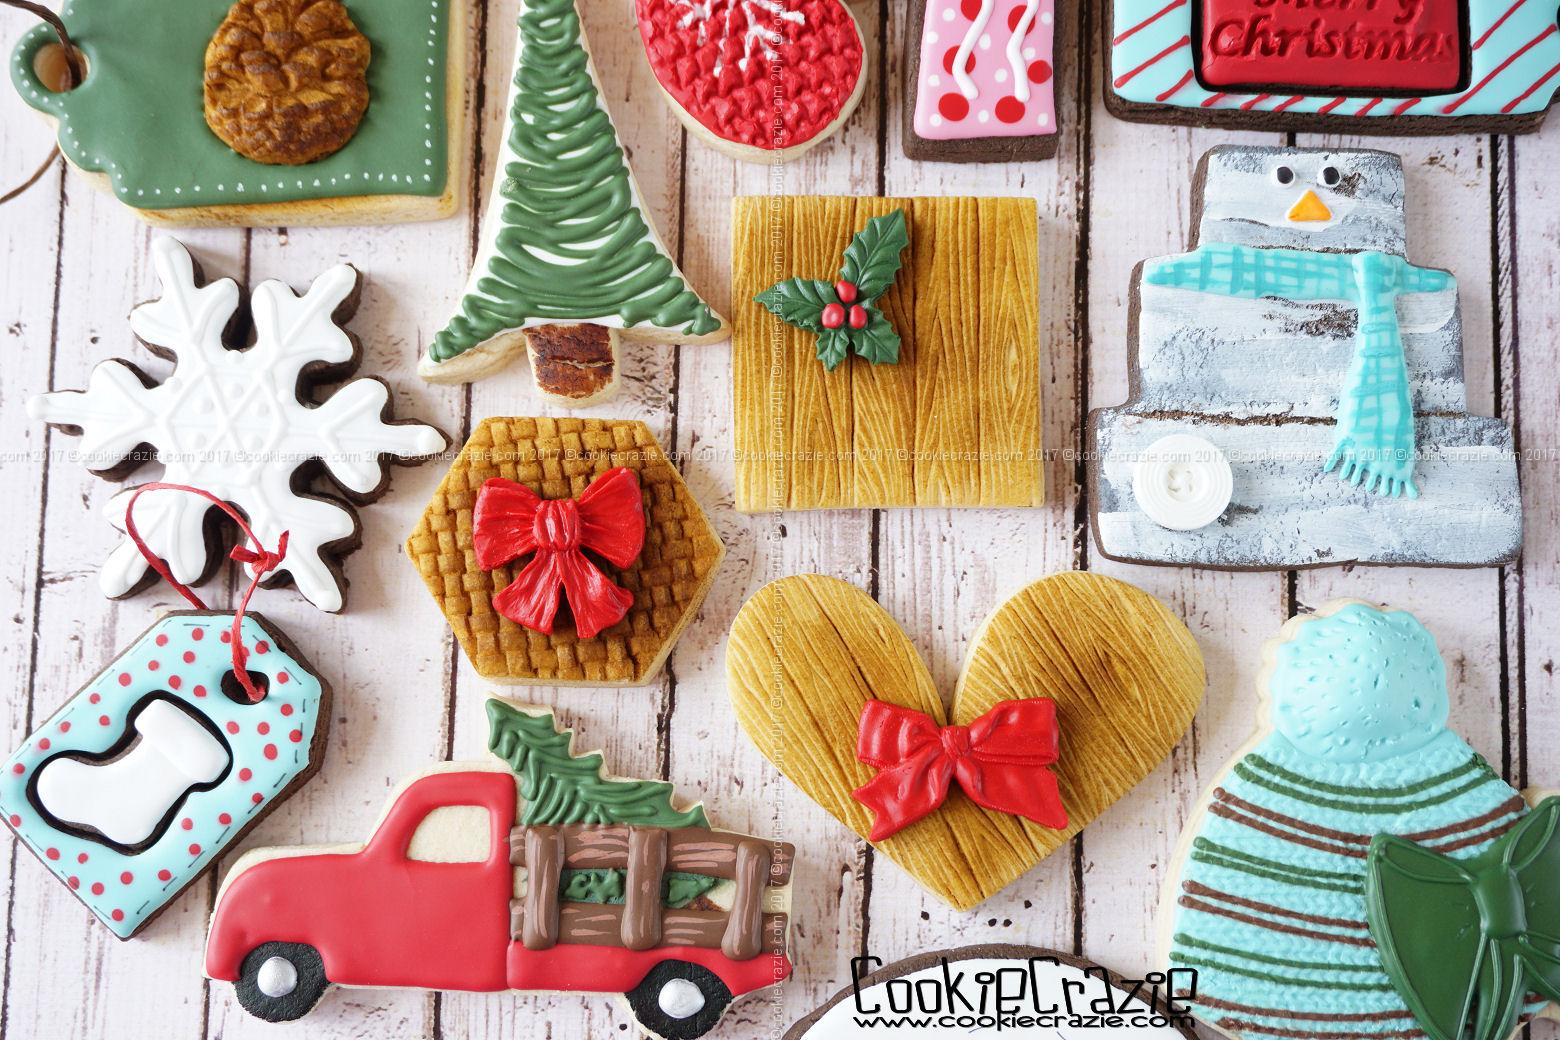 Basket & Wood Plank Christmas Decorated Sugar Cookies YouTube video  HERE